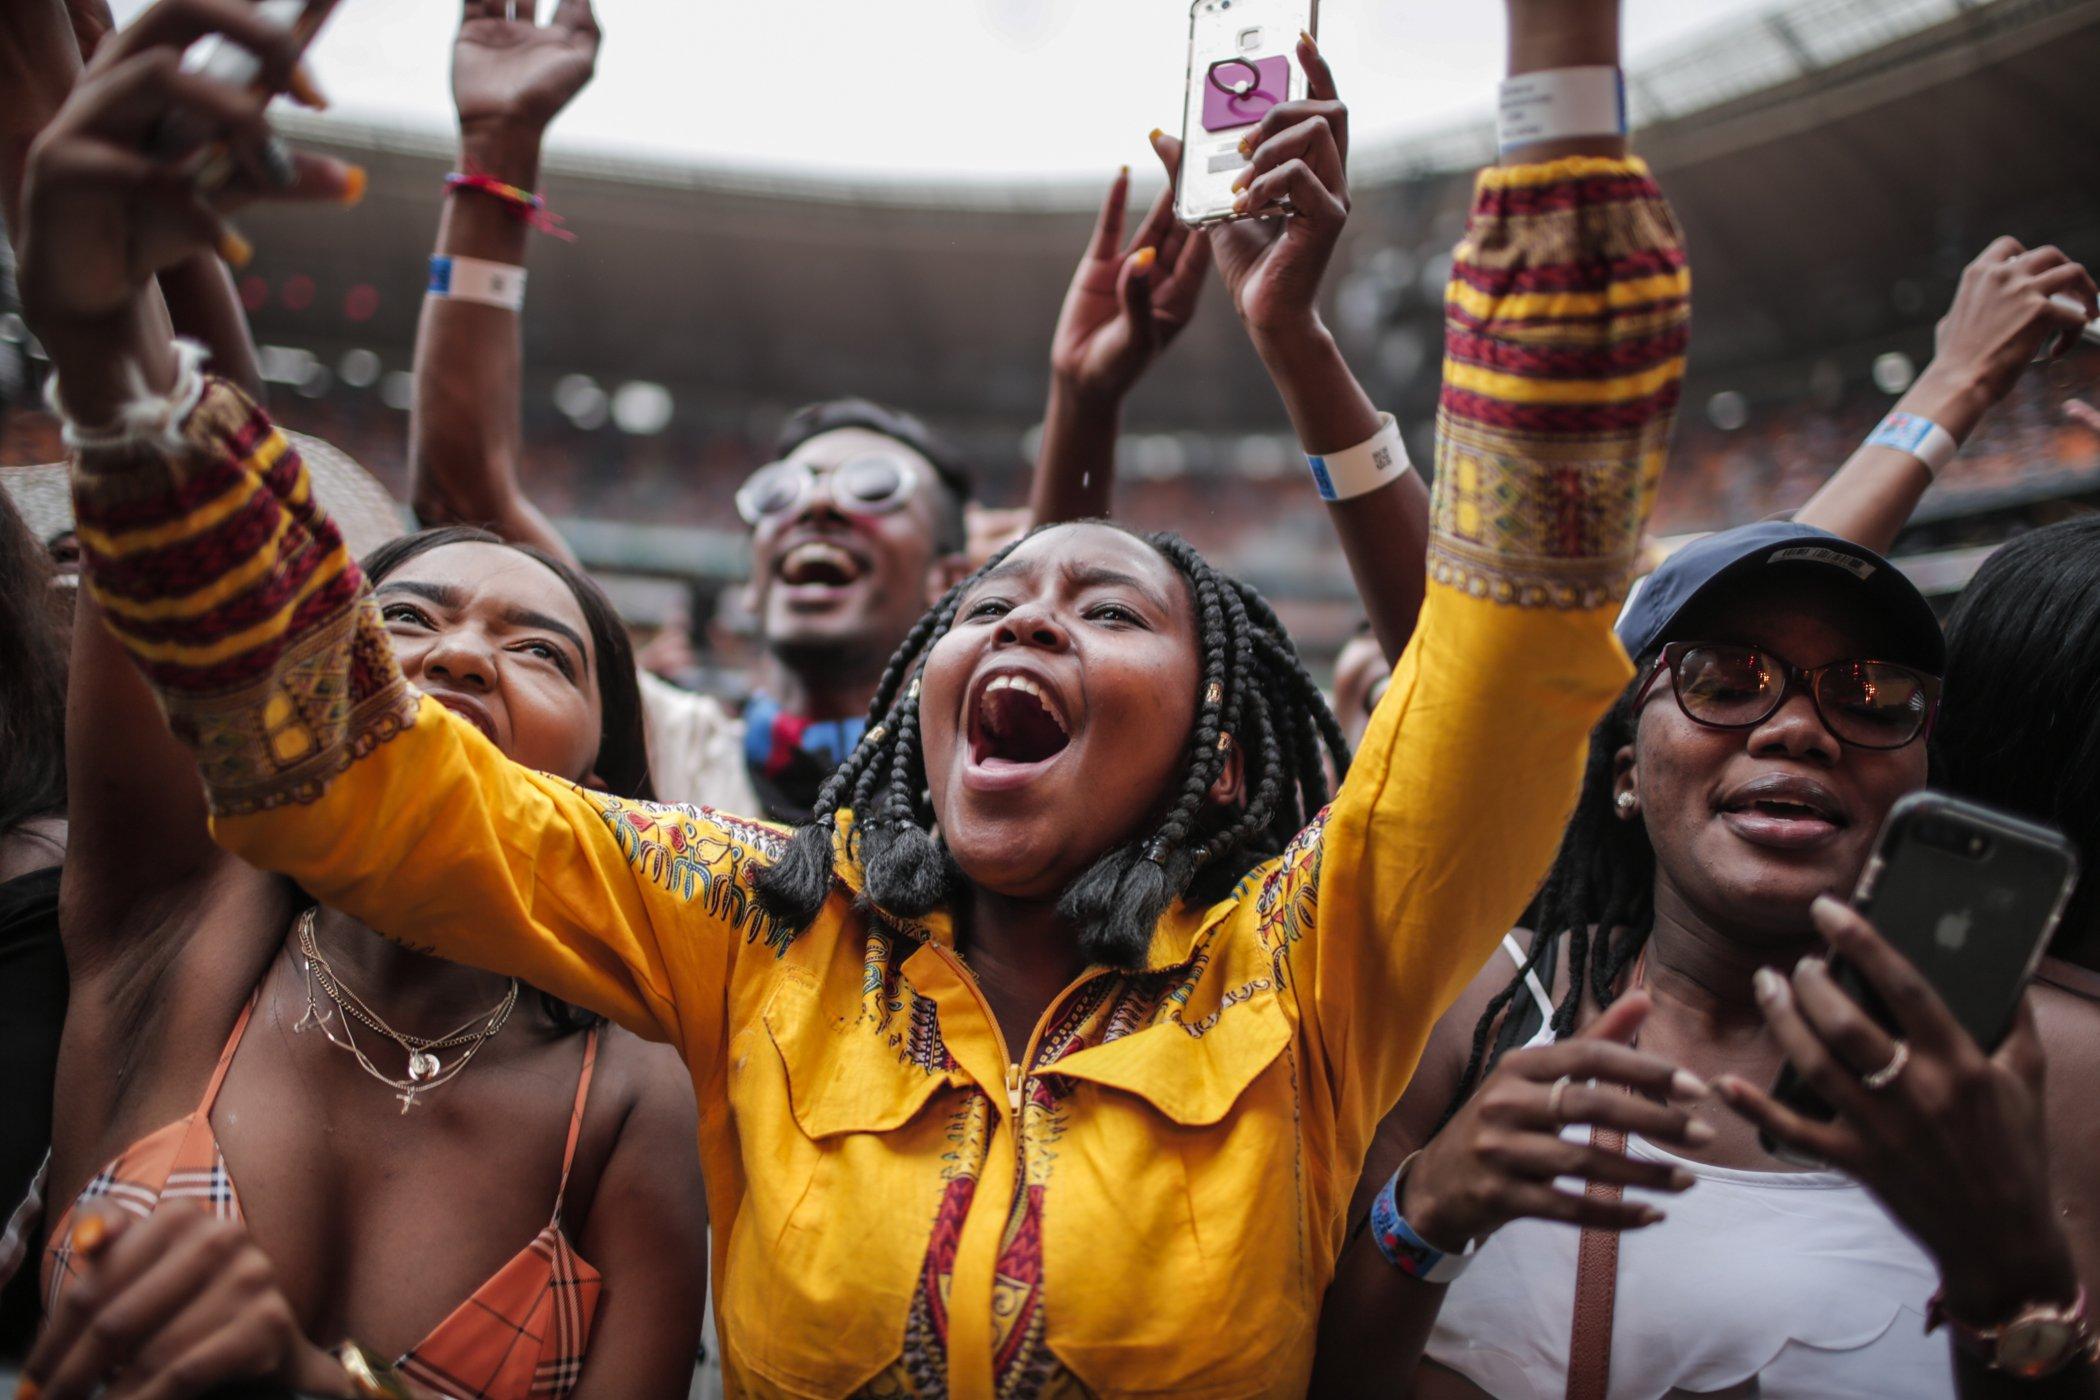 Mandela100_Crowd_GulshanKhanForGlobalCitizen_002.jpg